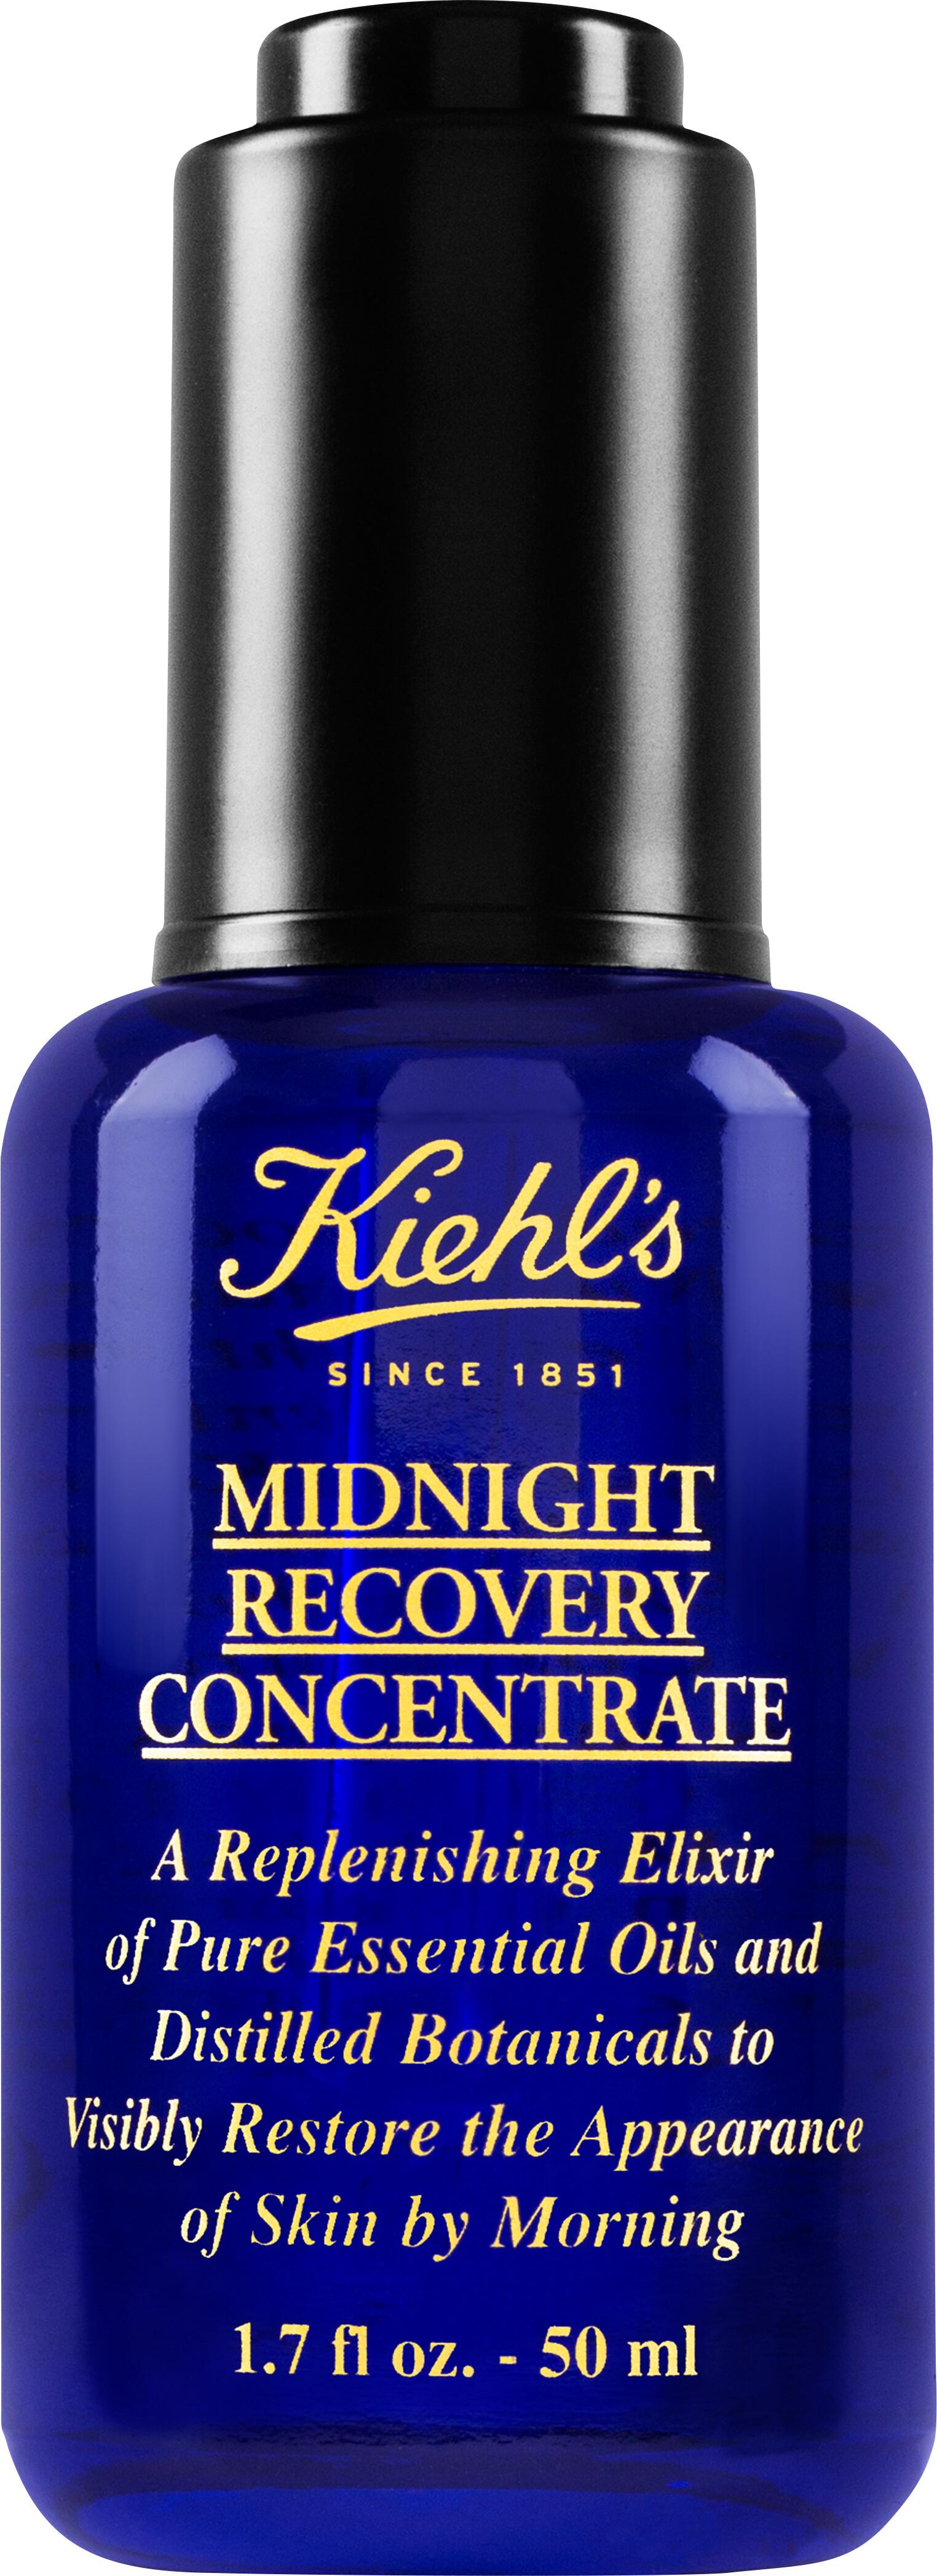 kiehls night recovery